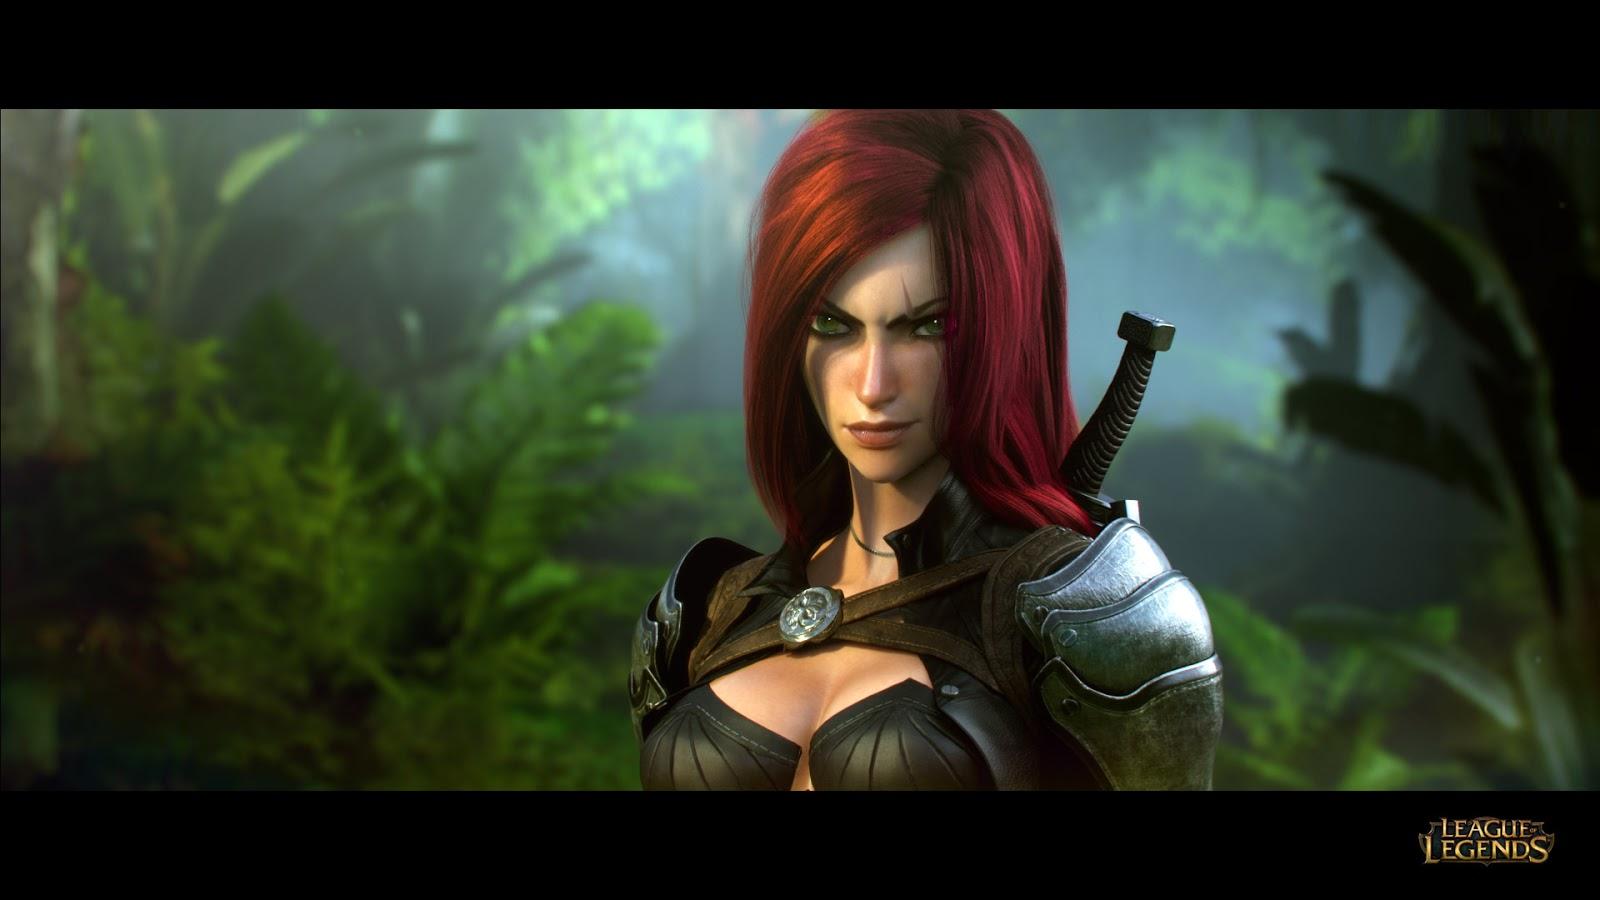 General 1600x900 League of Legends video games redhead boobs long hair women fantasy girl